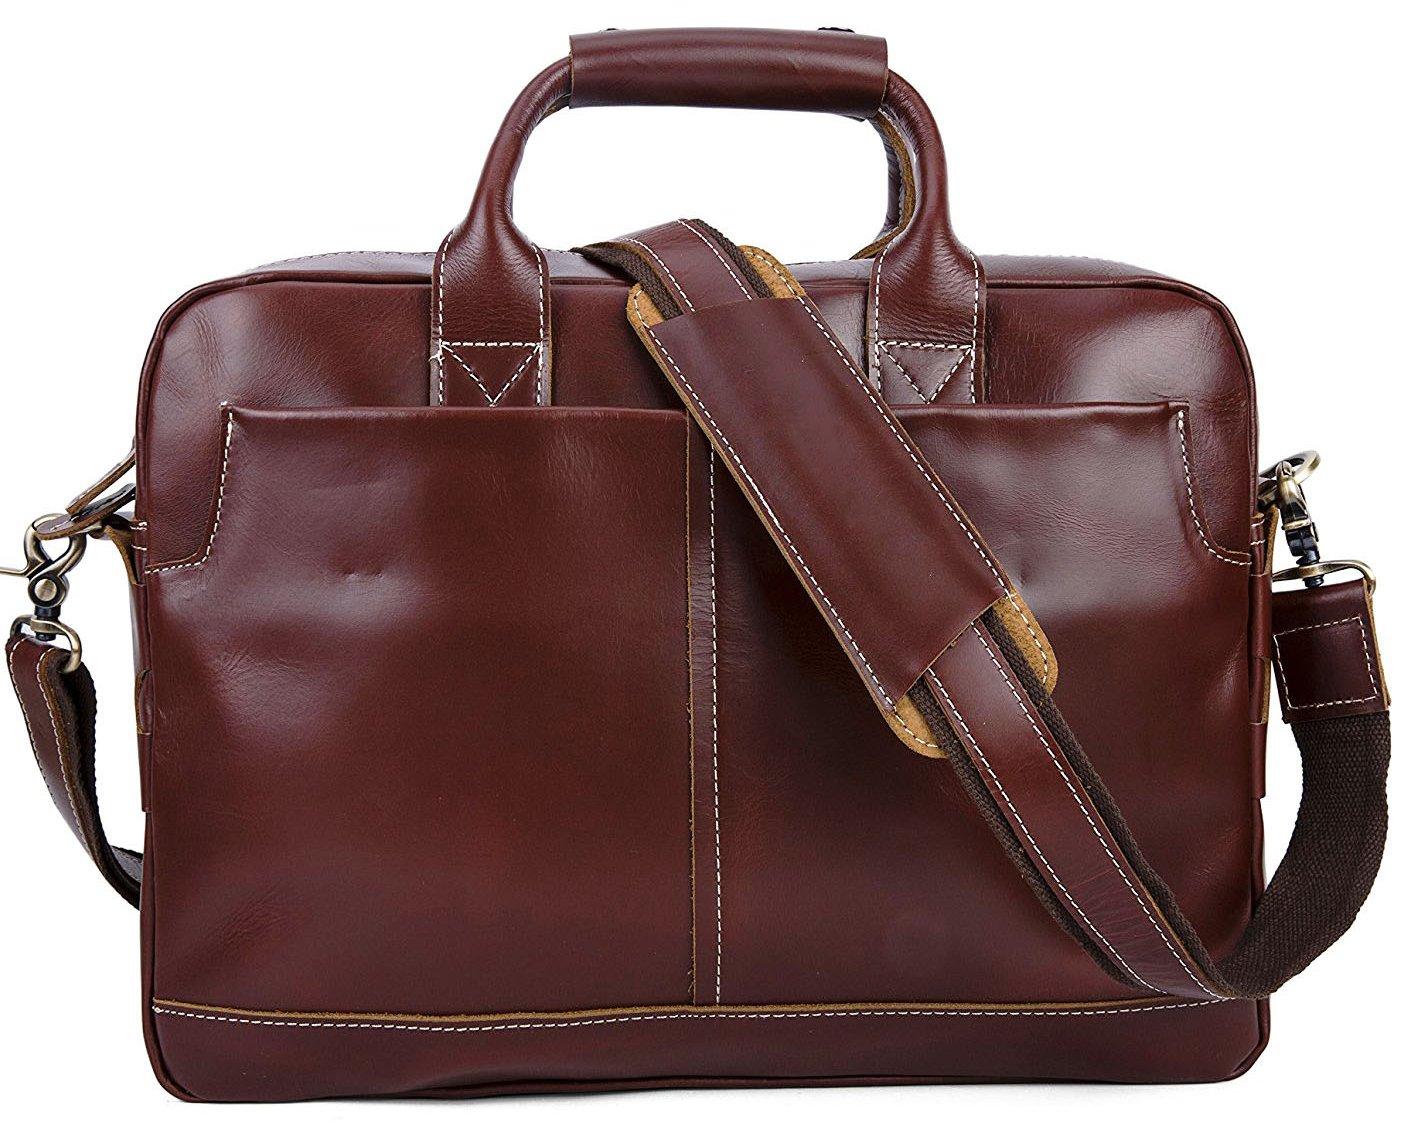 Men's Leather Laptop Briefcase Vintage Satchel Shoulder Tote Bag Attache Cases Portfolio Bag (Burgundy)